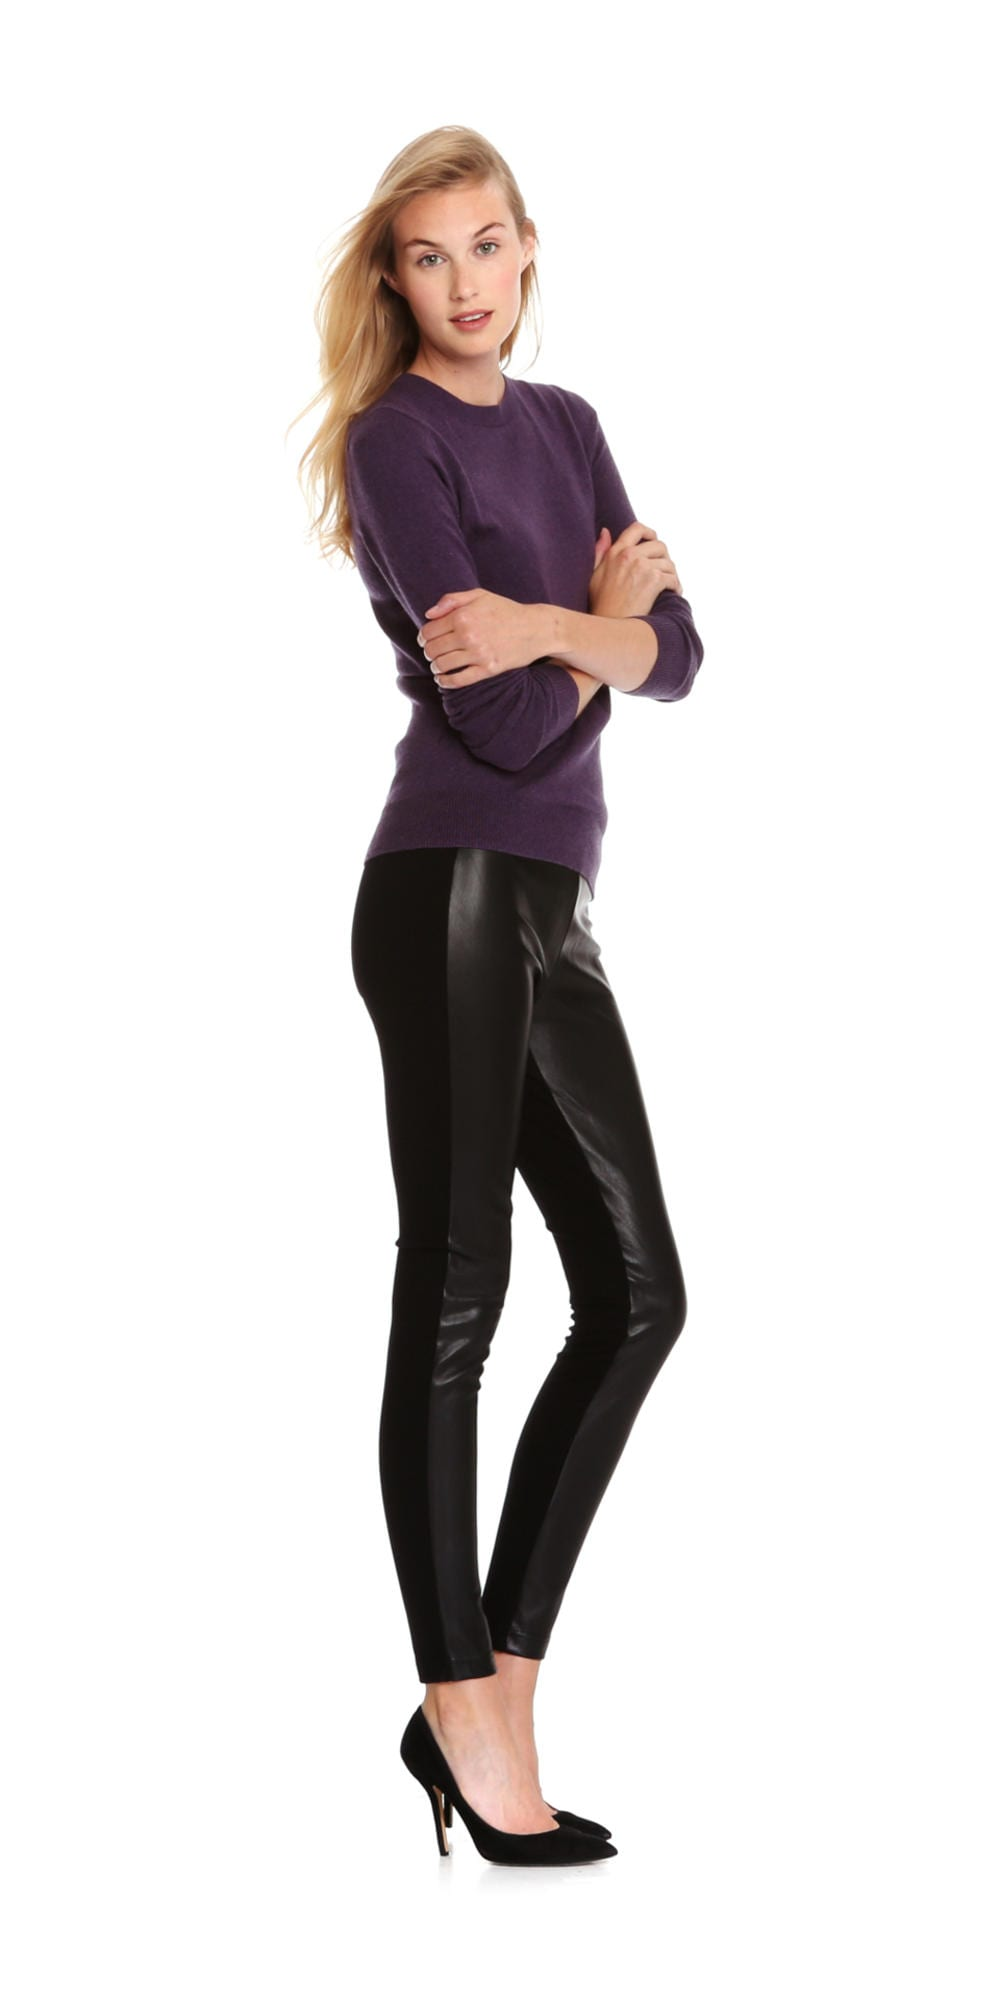 cb6c6fa9938 Faux Leather Legging in Black from Joe Fresh